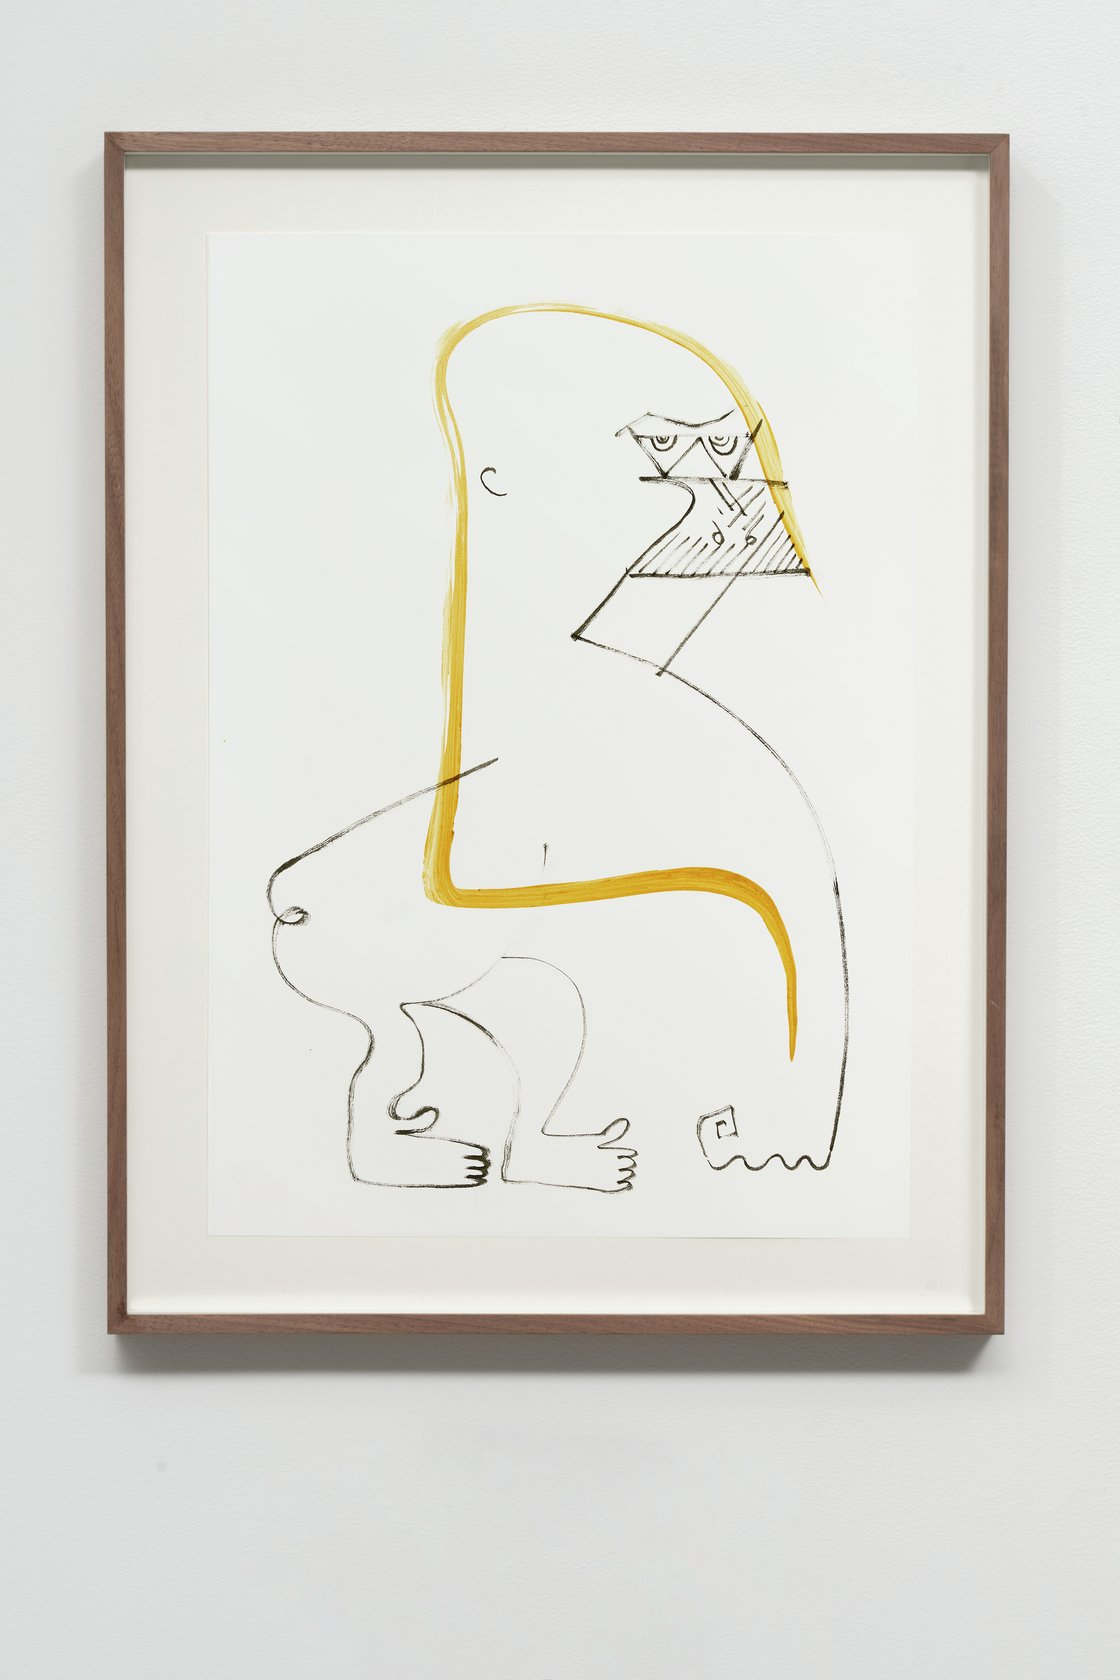 Abraham Cruzvillegas, Autoportrait avec pouce opposable XXXVIII, 2020